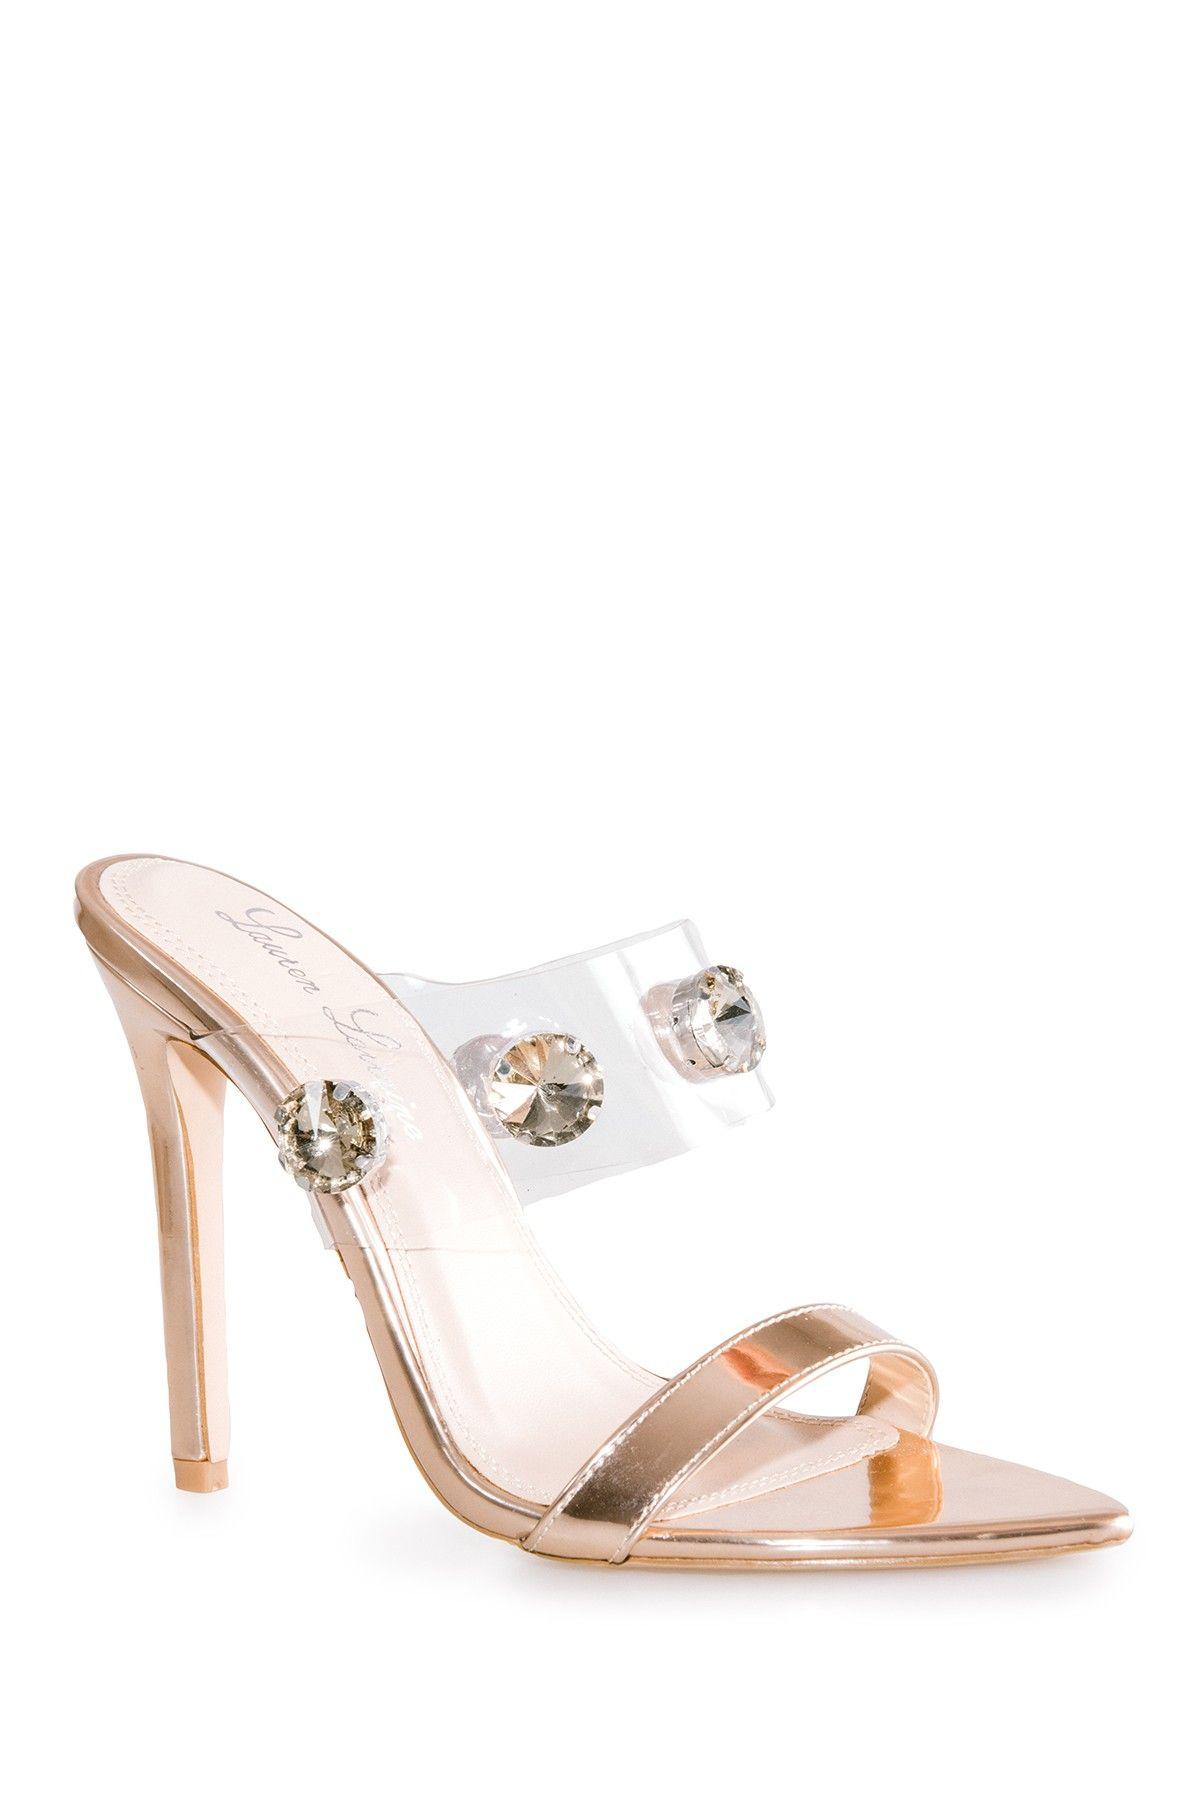 Lauren Lorraine Paula 3 Peep Toe Pump | Peep toe pumps